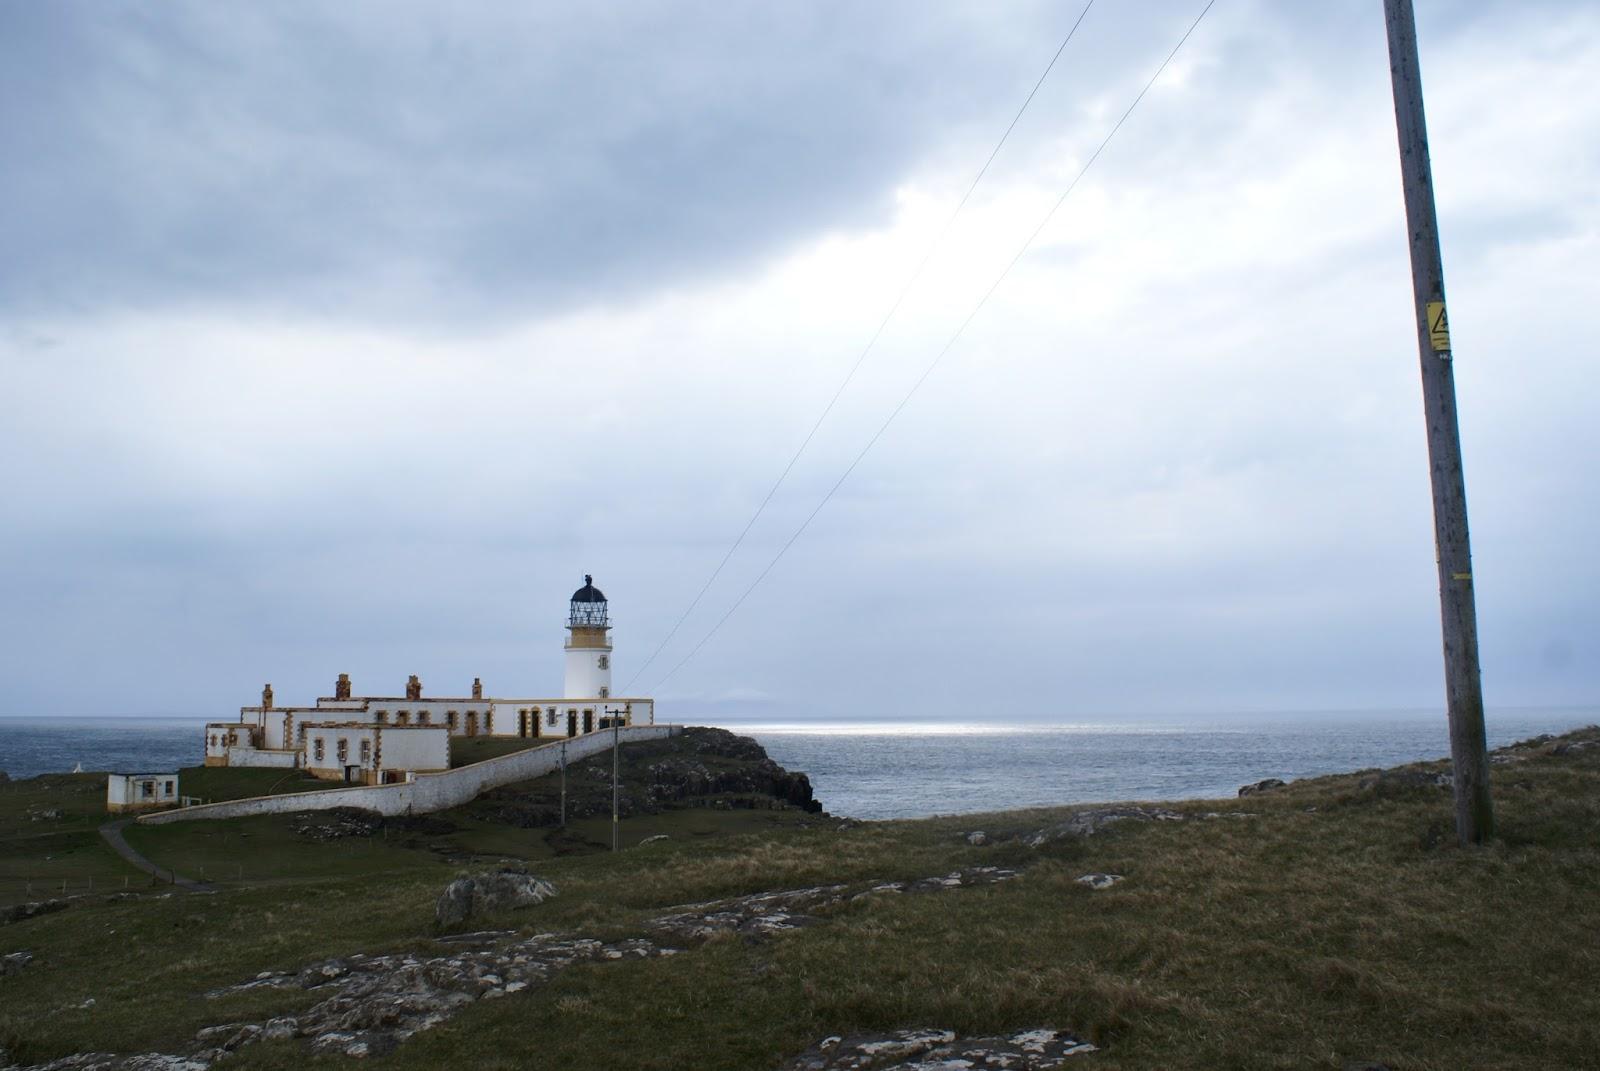 lighthouse neist point skye scotland alba uk united kingdom